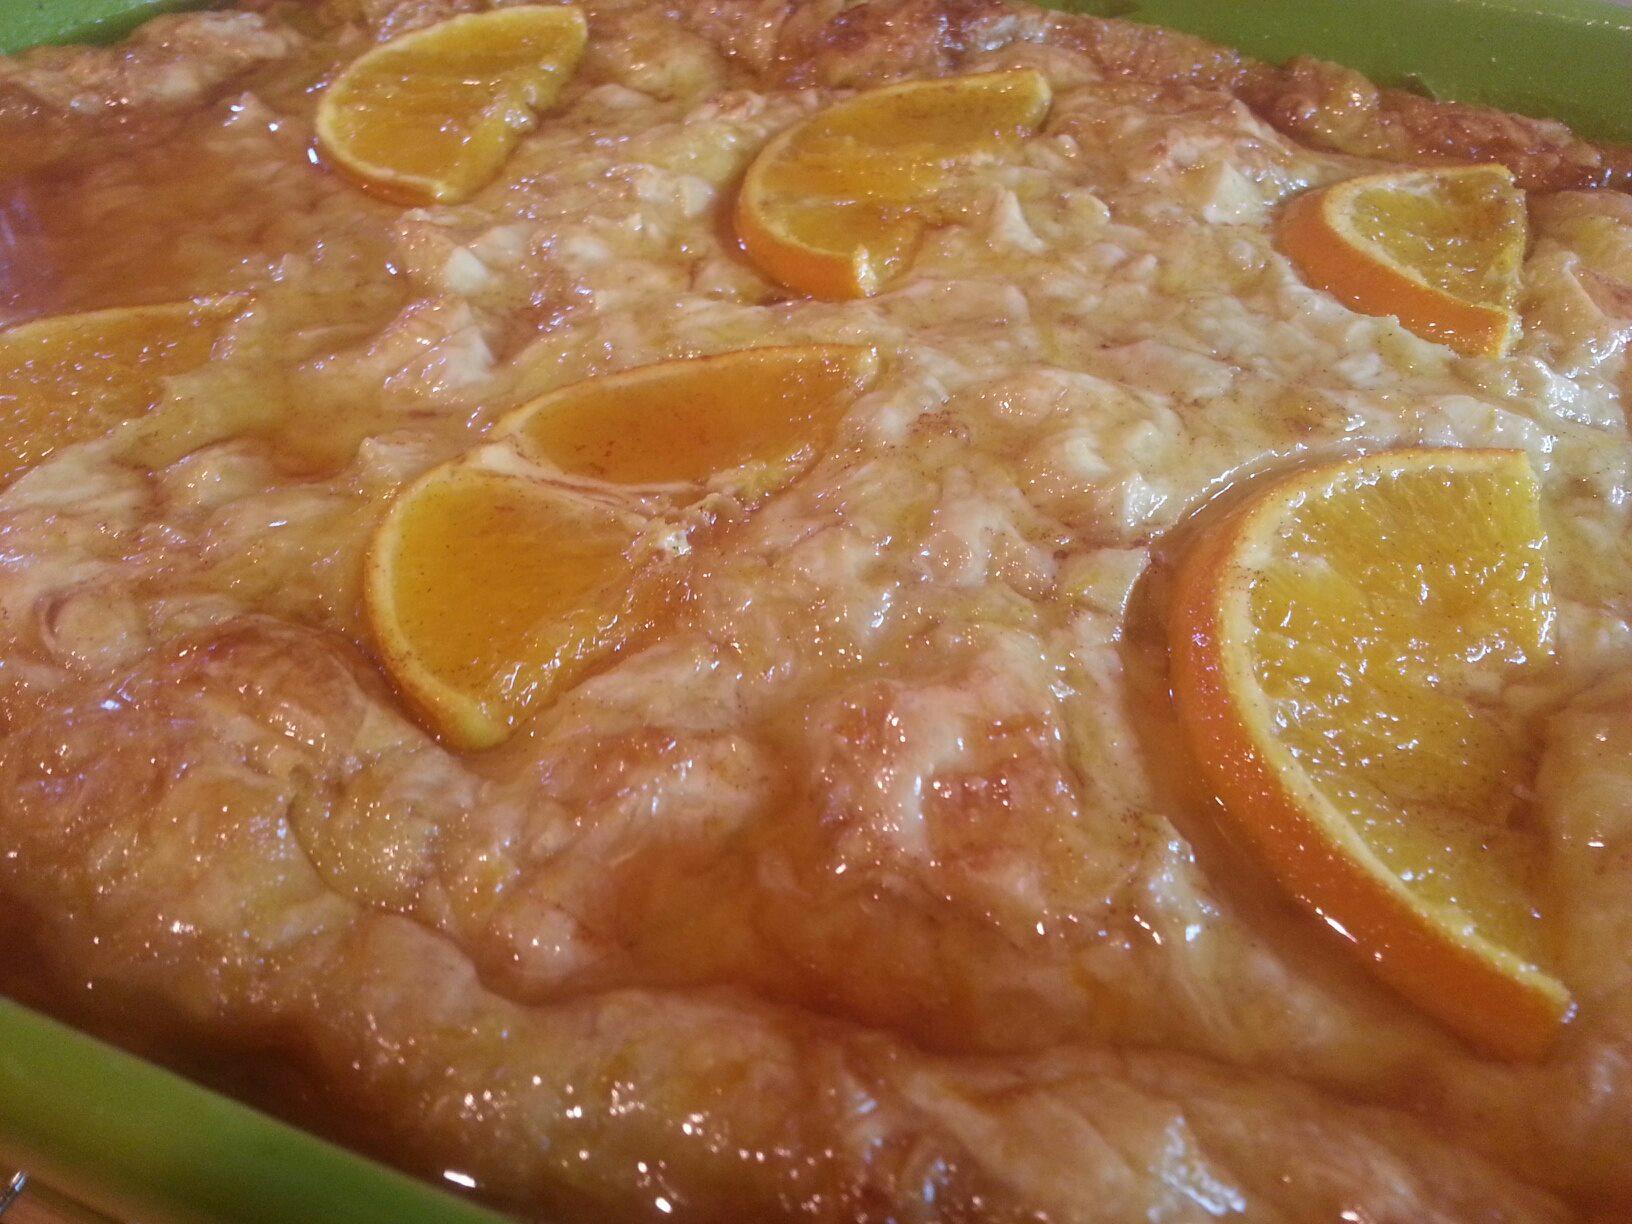 Portokalopita (Greek Orange Phyllo Cake) Syd